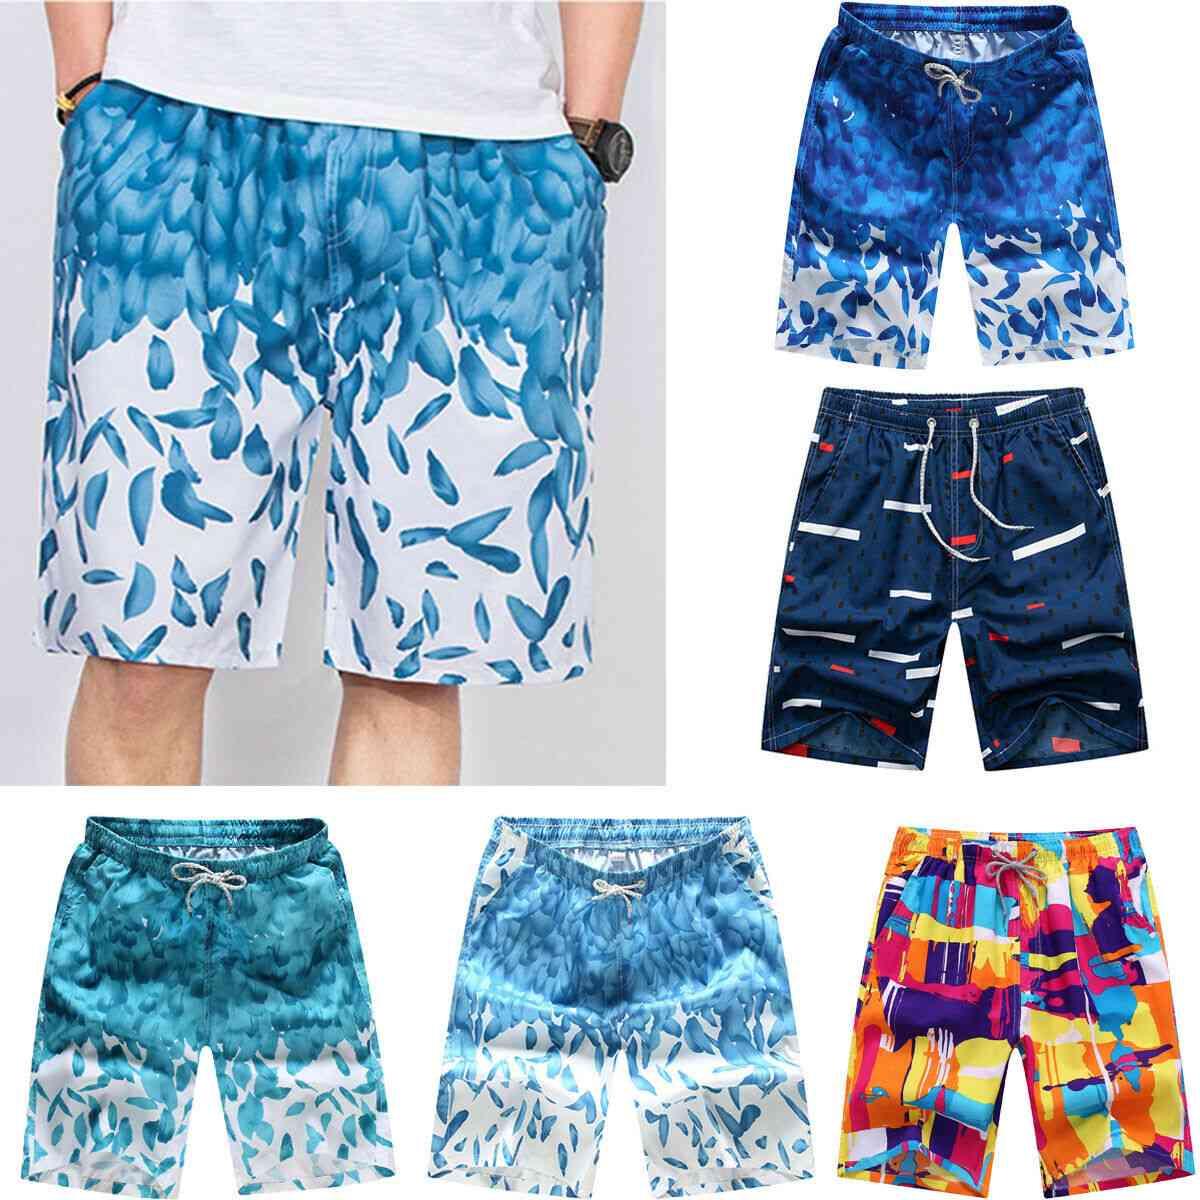 Men's Swim Trunks Beach Shorts, Summer Sports Pants Breathable